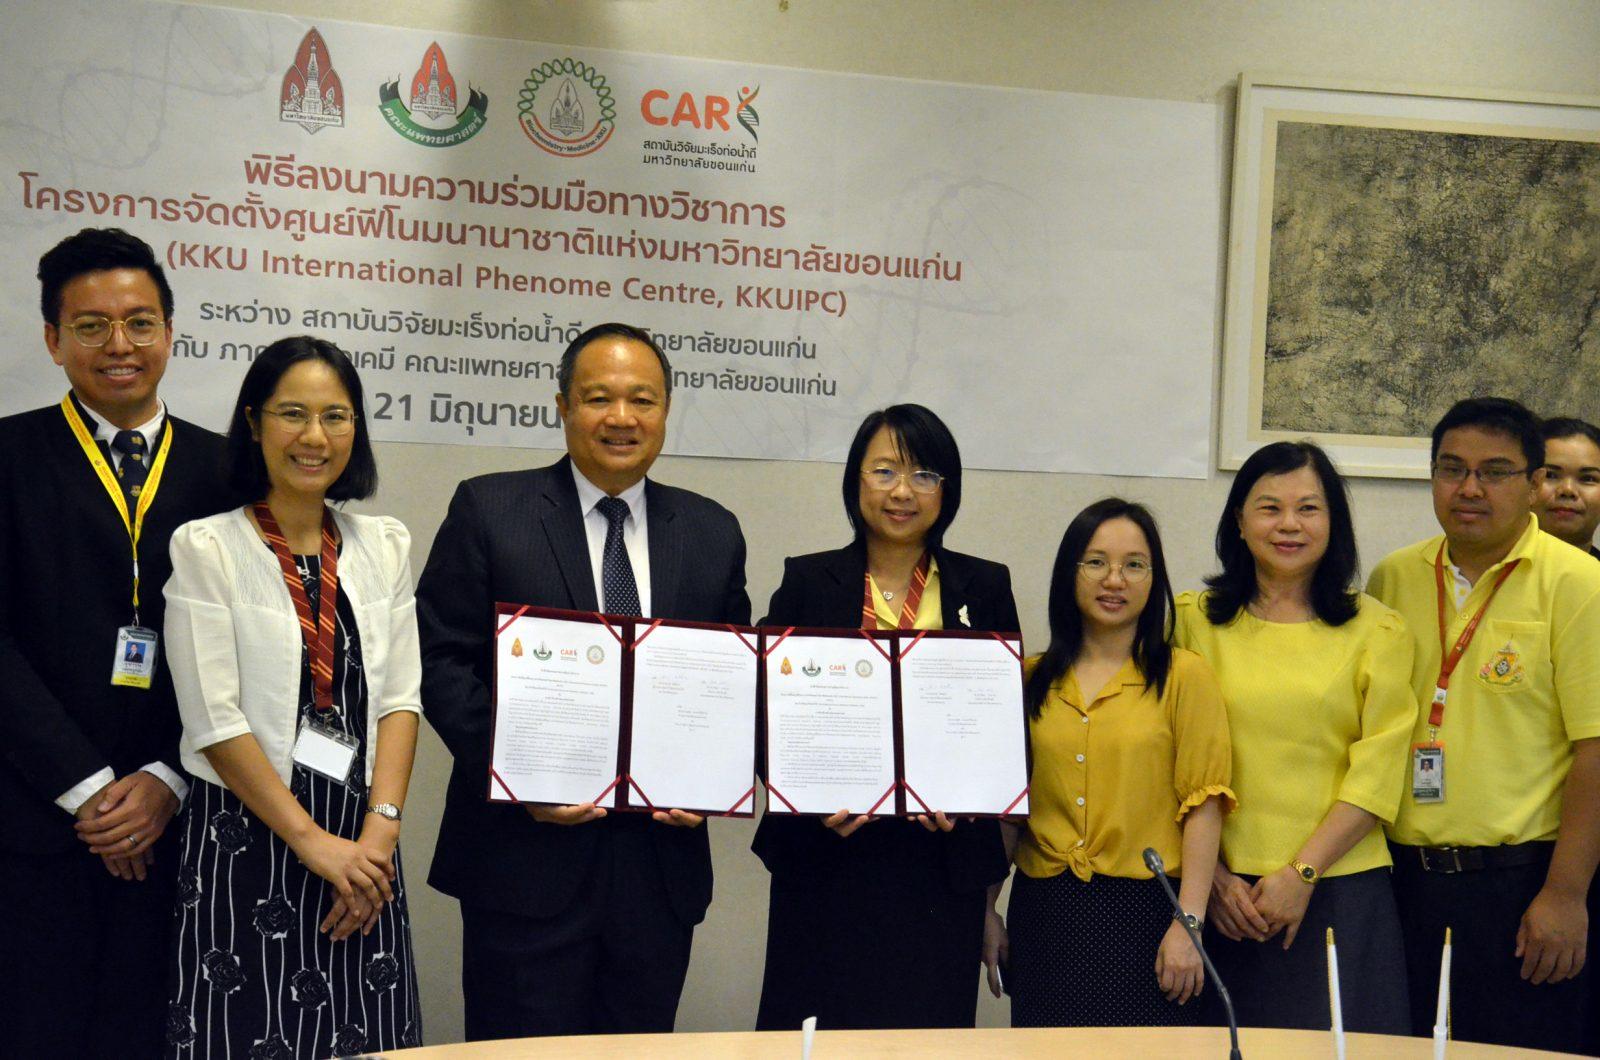 KKU International Phenome Center (KKUIPC) opens to serve industries in the bio-economics era